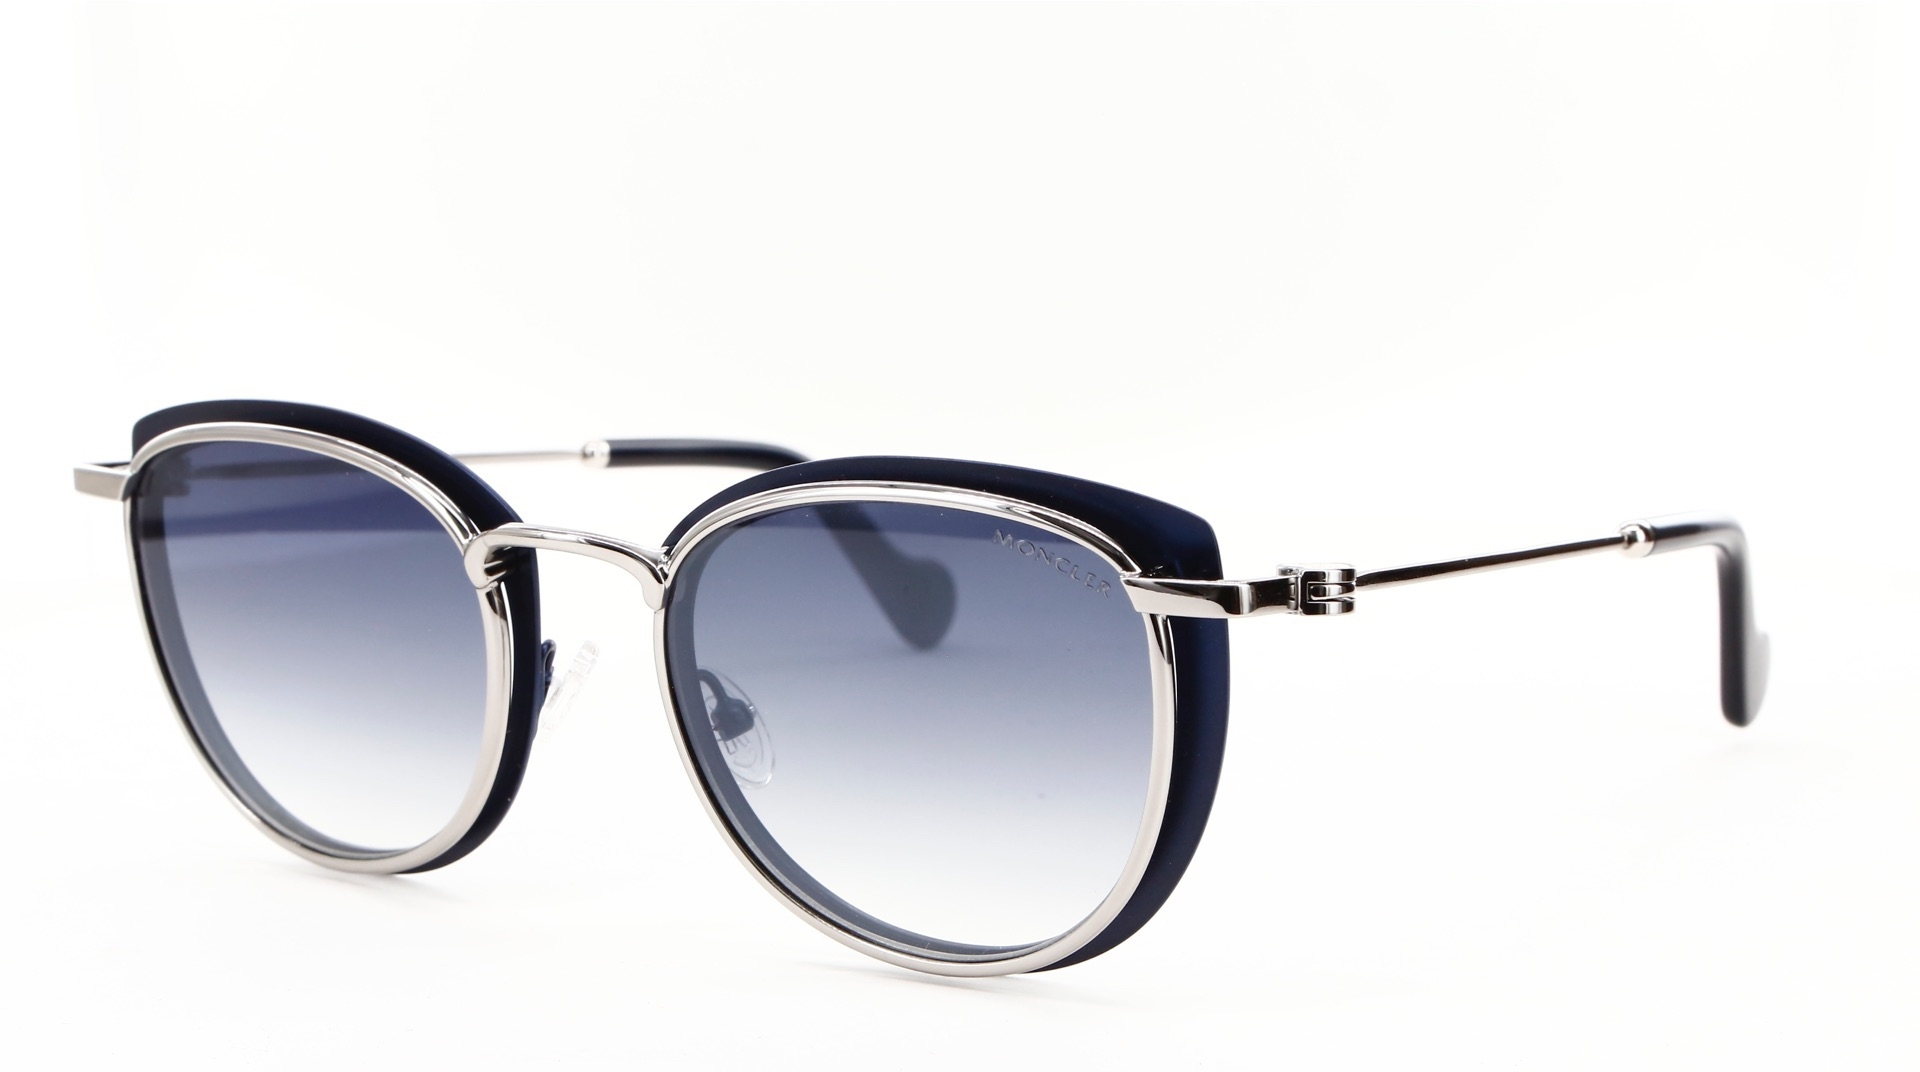 2da974d1a61 MONCLER sunglasses - ref  78835